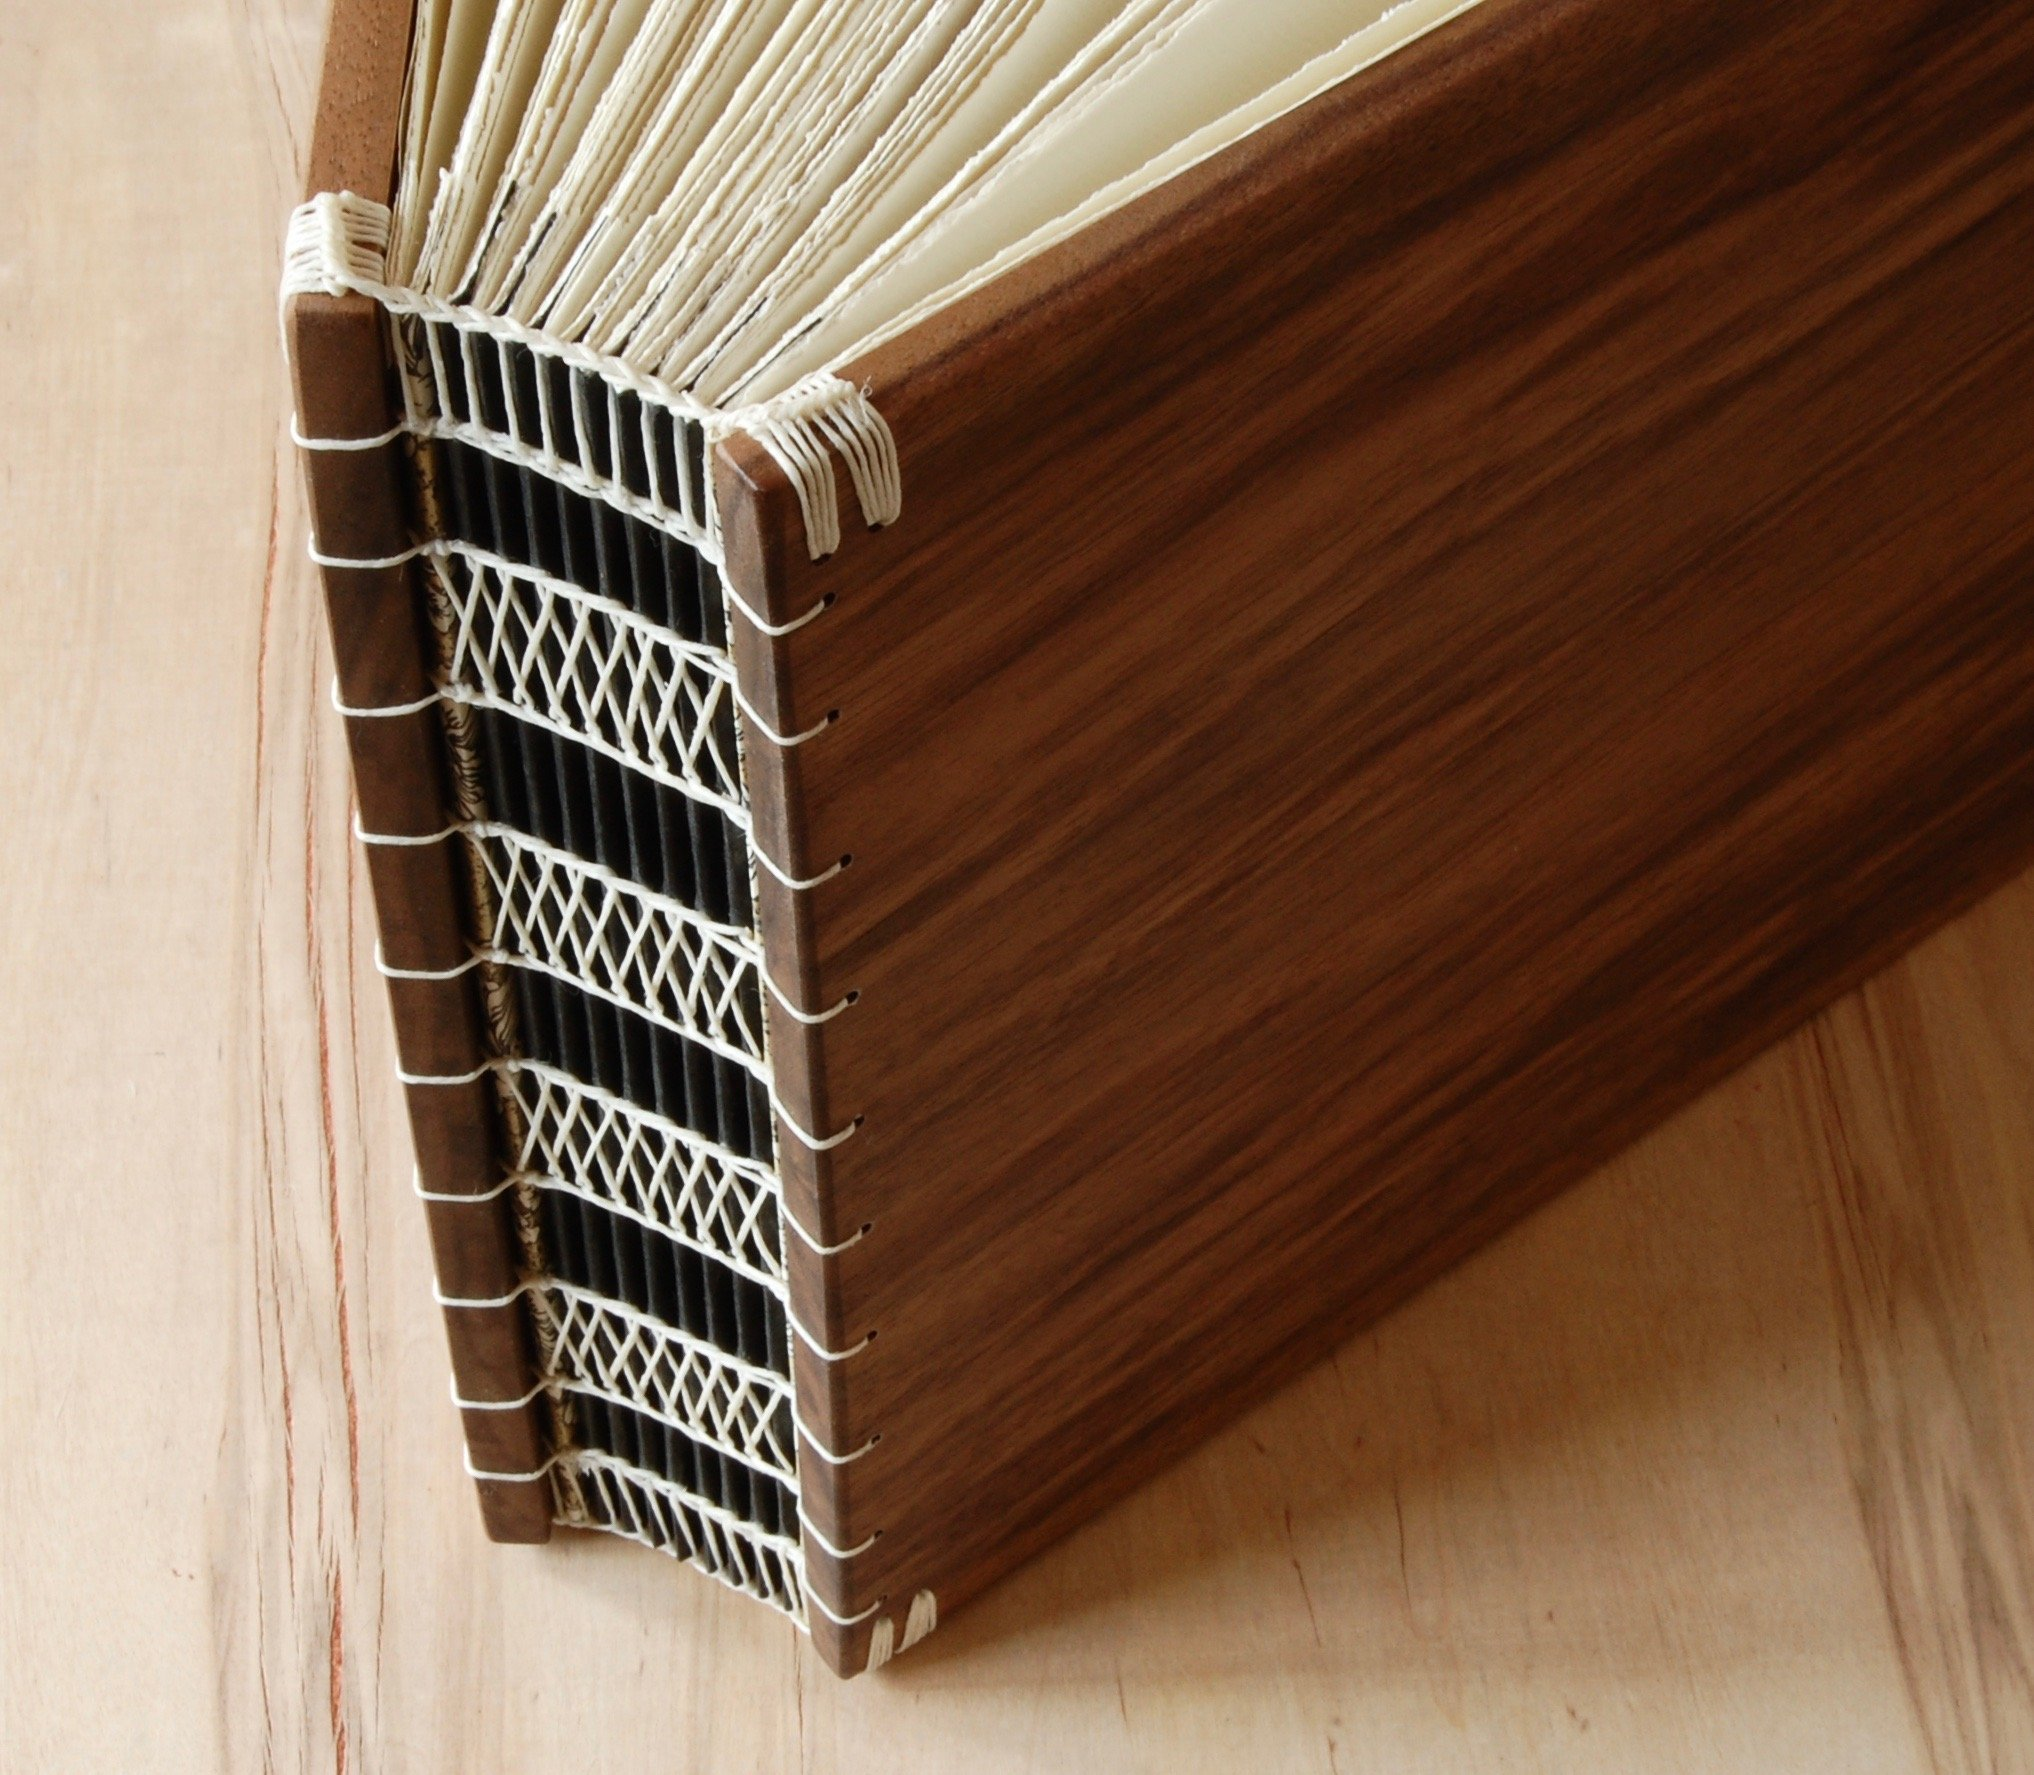 Handmade Instant Photo Wedding Guest Book or Scrapbook - Black Walnut Wood